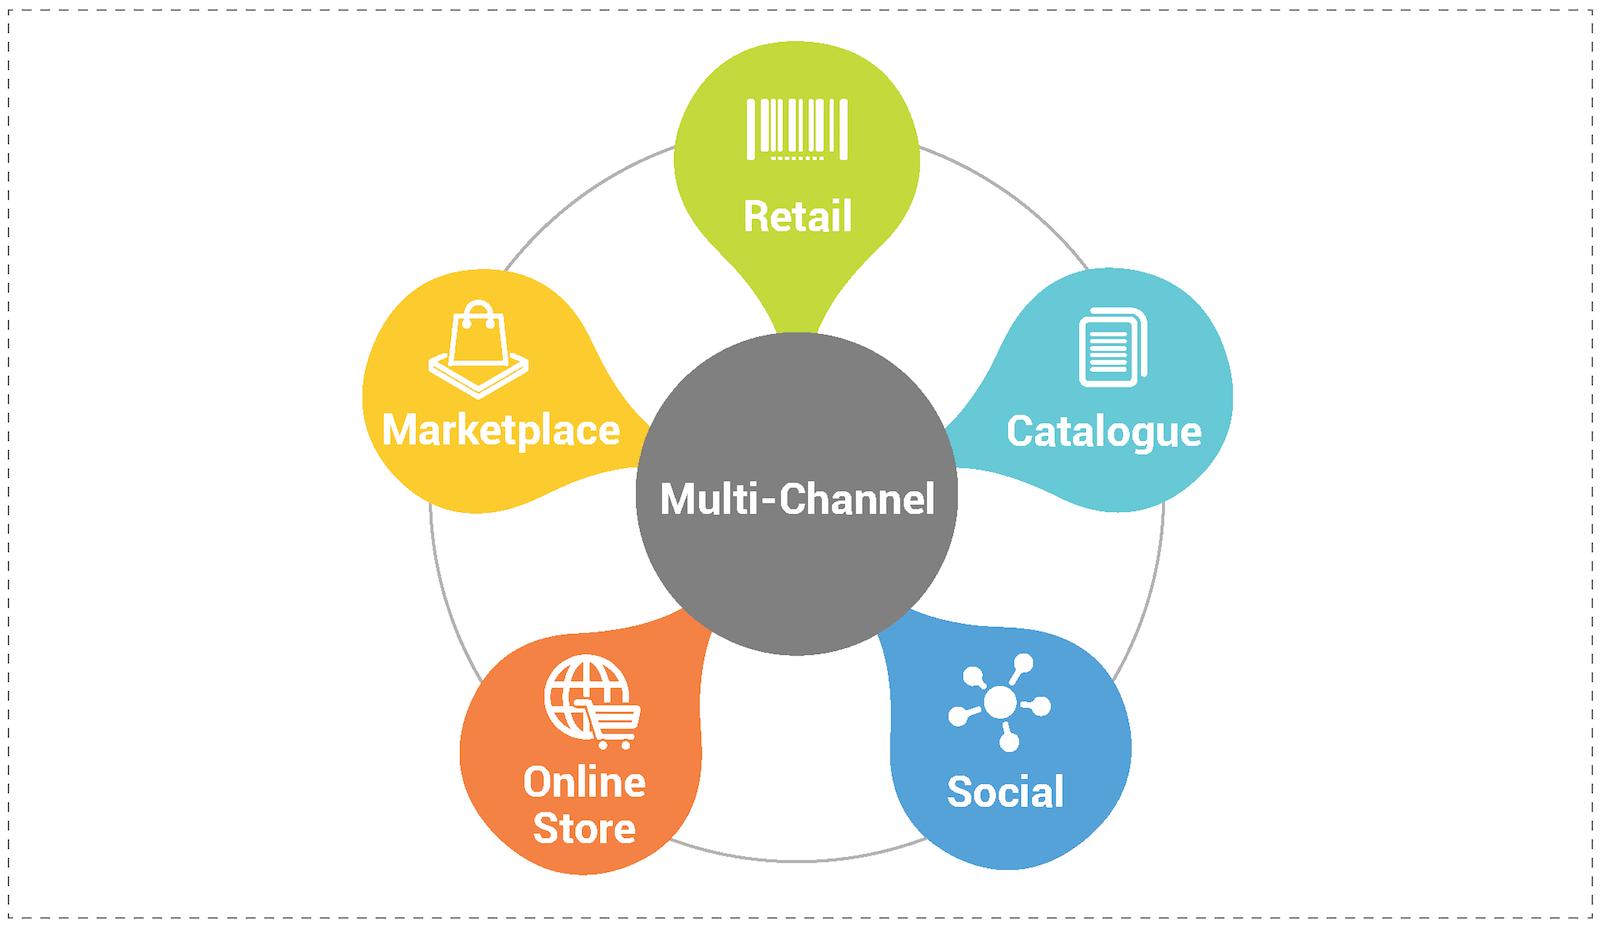 Multichannel strategy: online store, social, catalogue, retail, marketplace